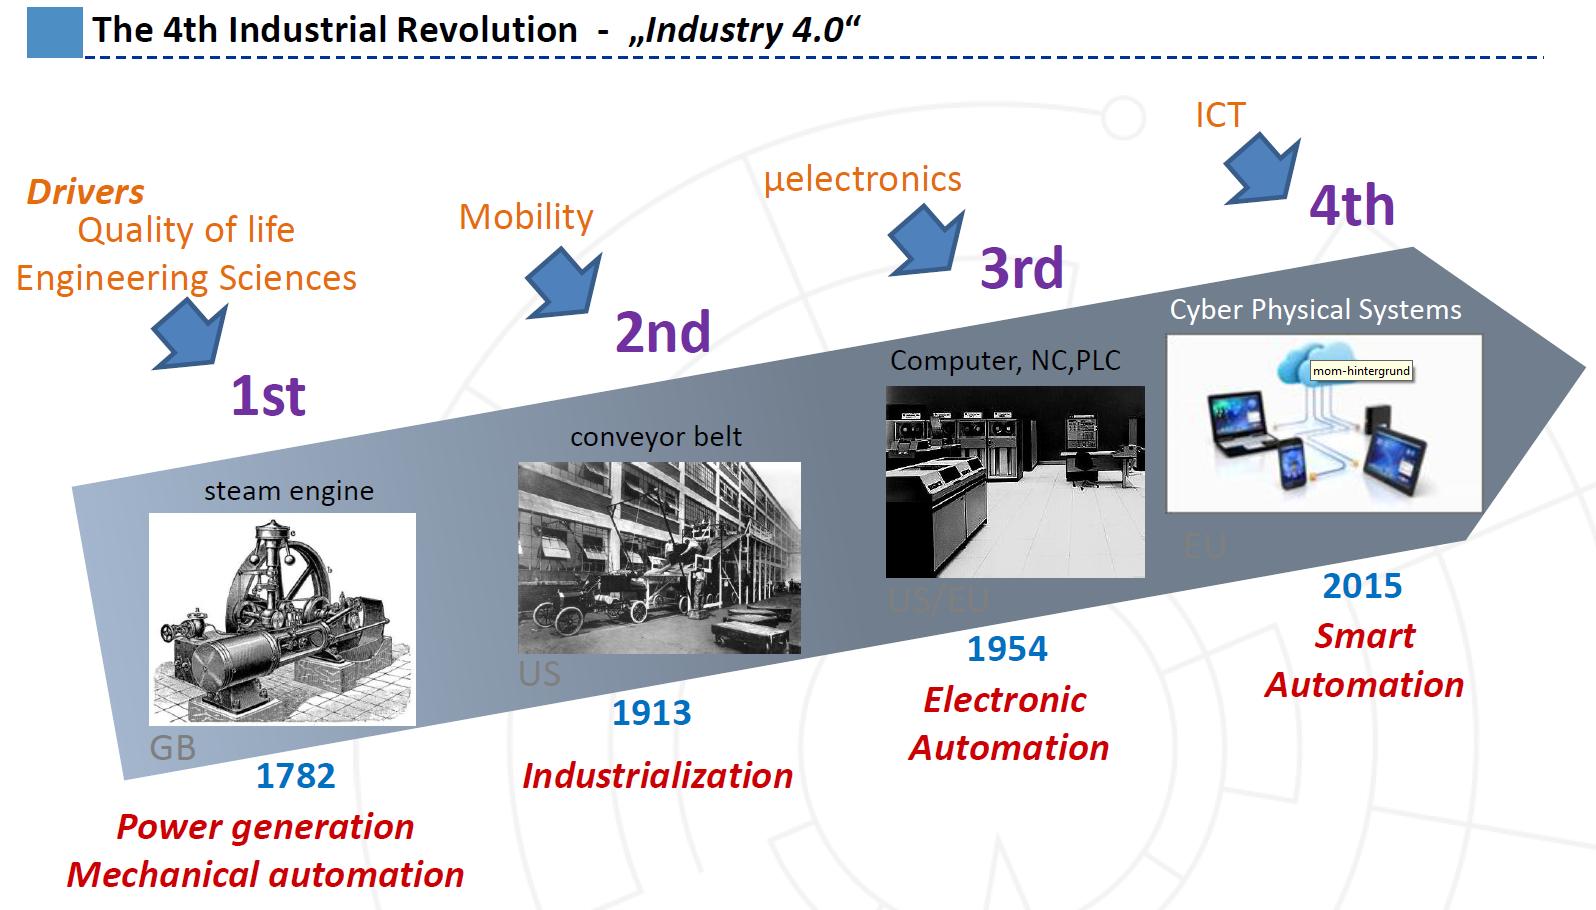 industria-4-0 evoluzione storica